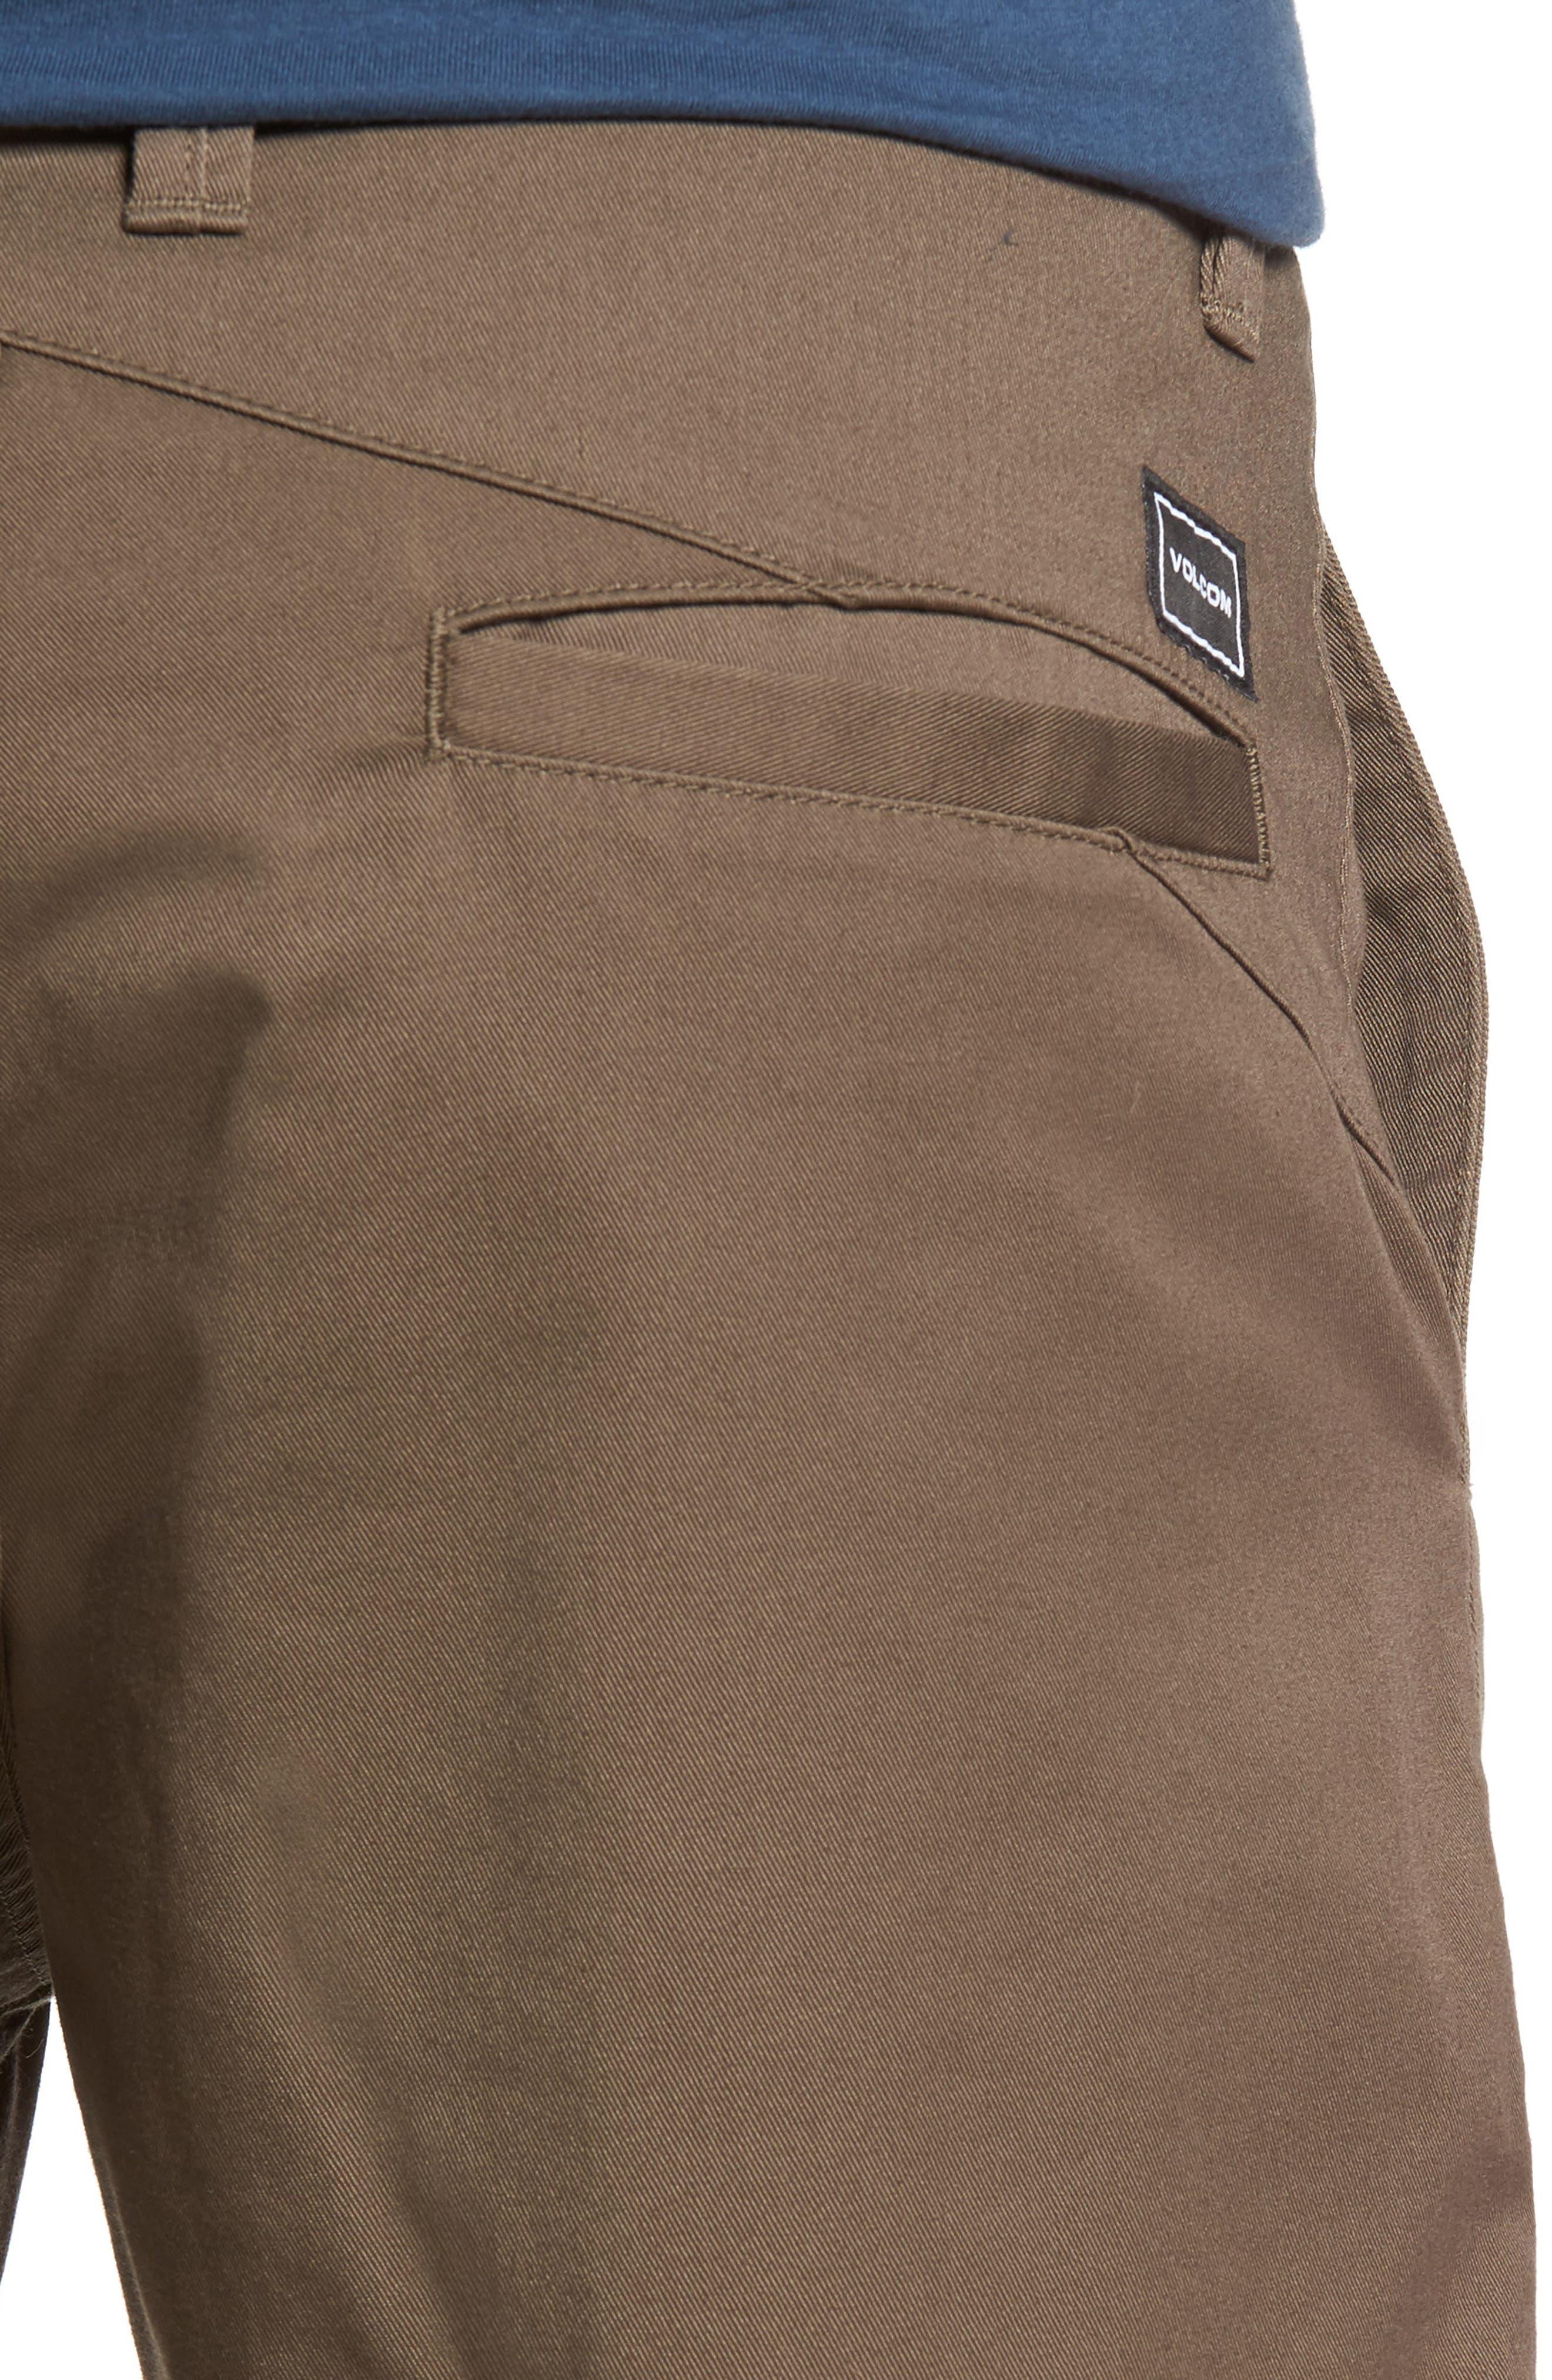 Drifter Modern Chino Shorts,                             Alternate thumbnail 4, color,                             Mushroom